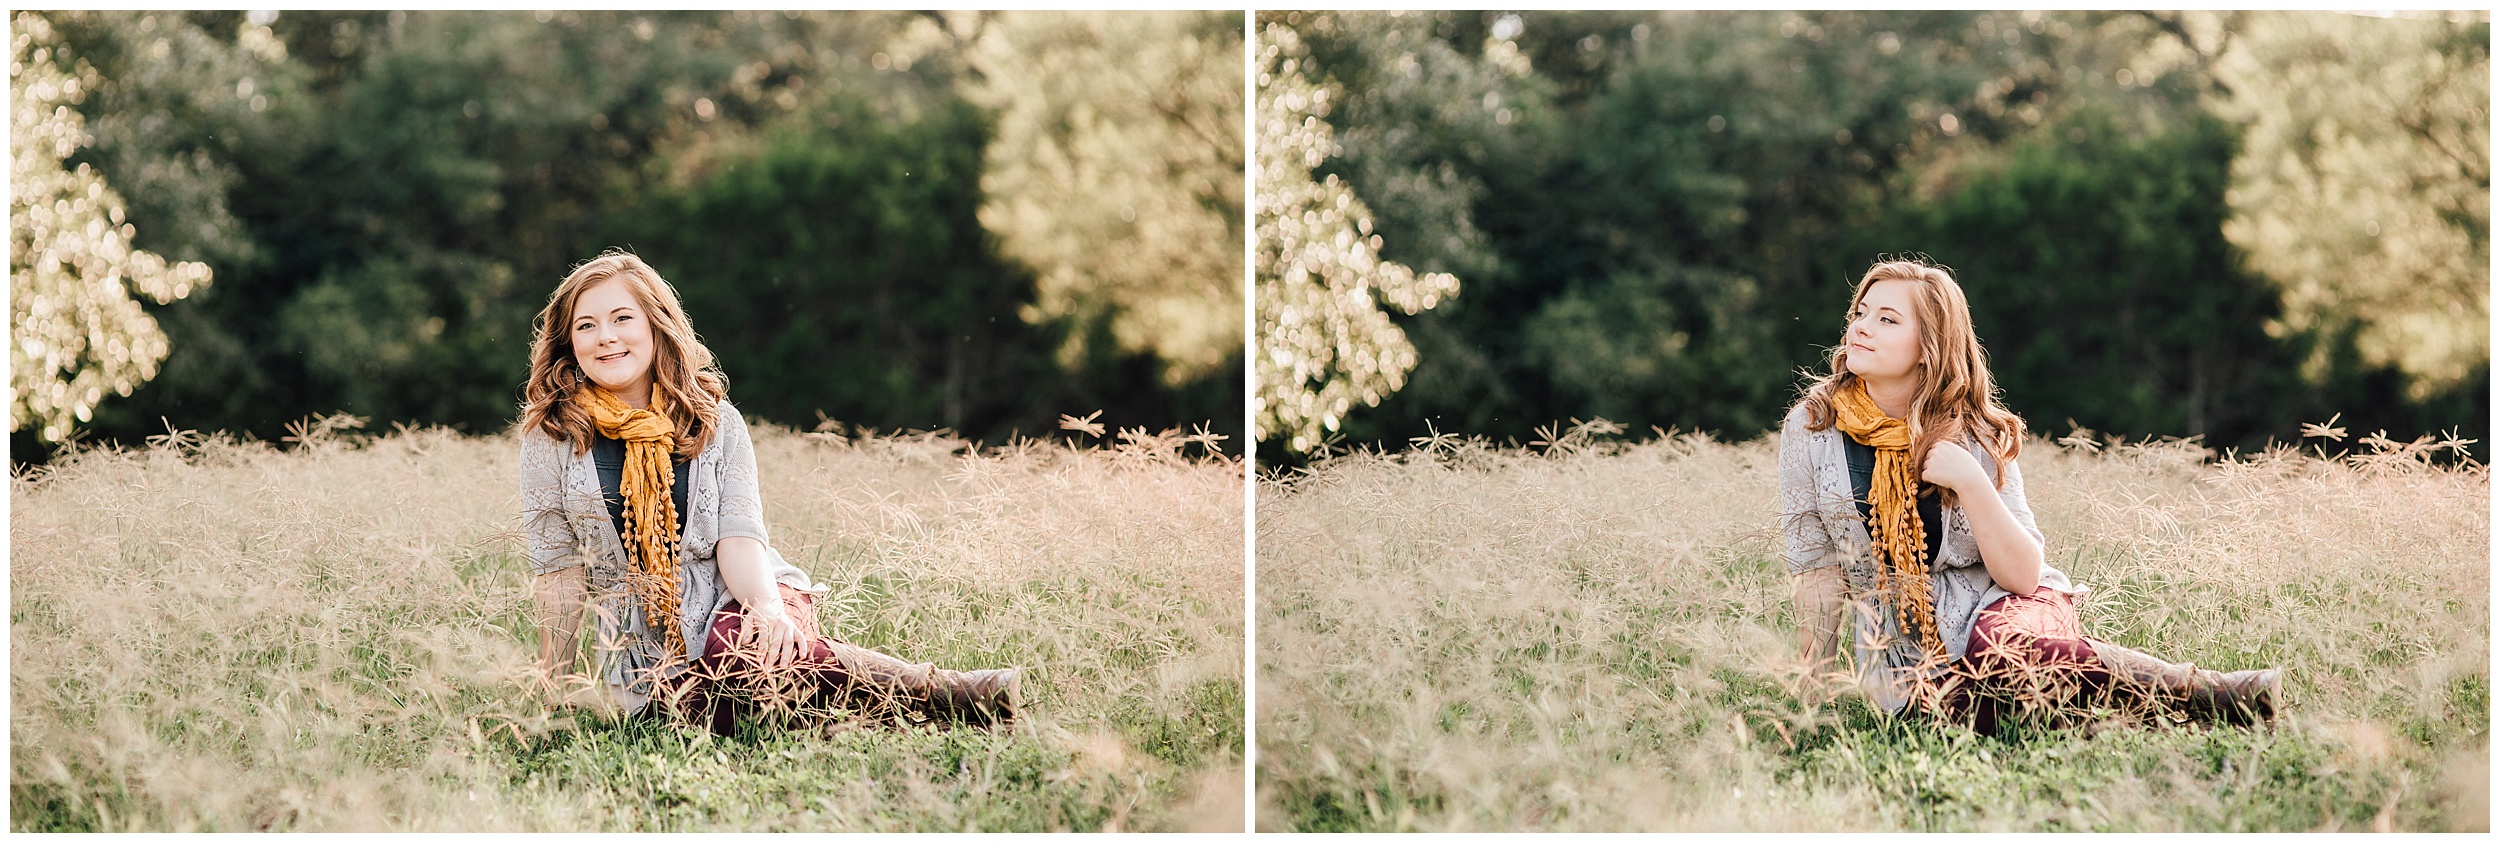 Austin Senior Photographer12.jpg